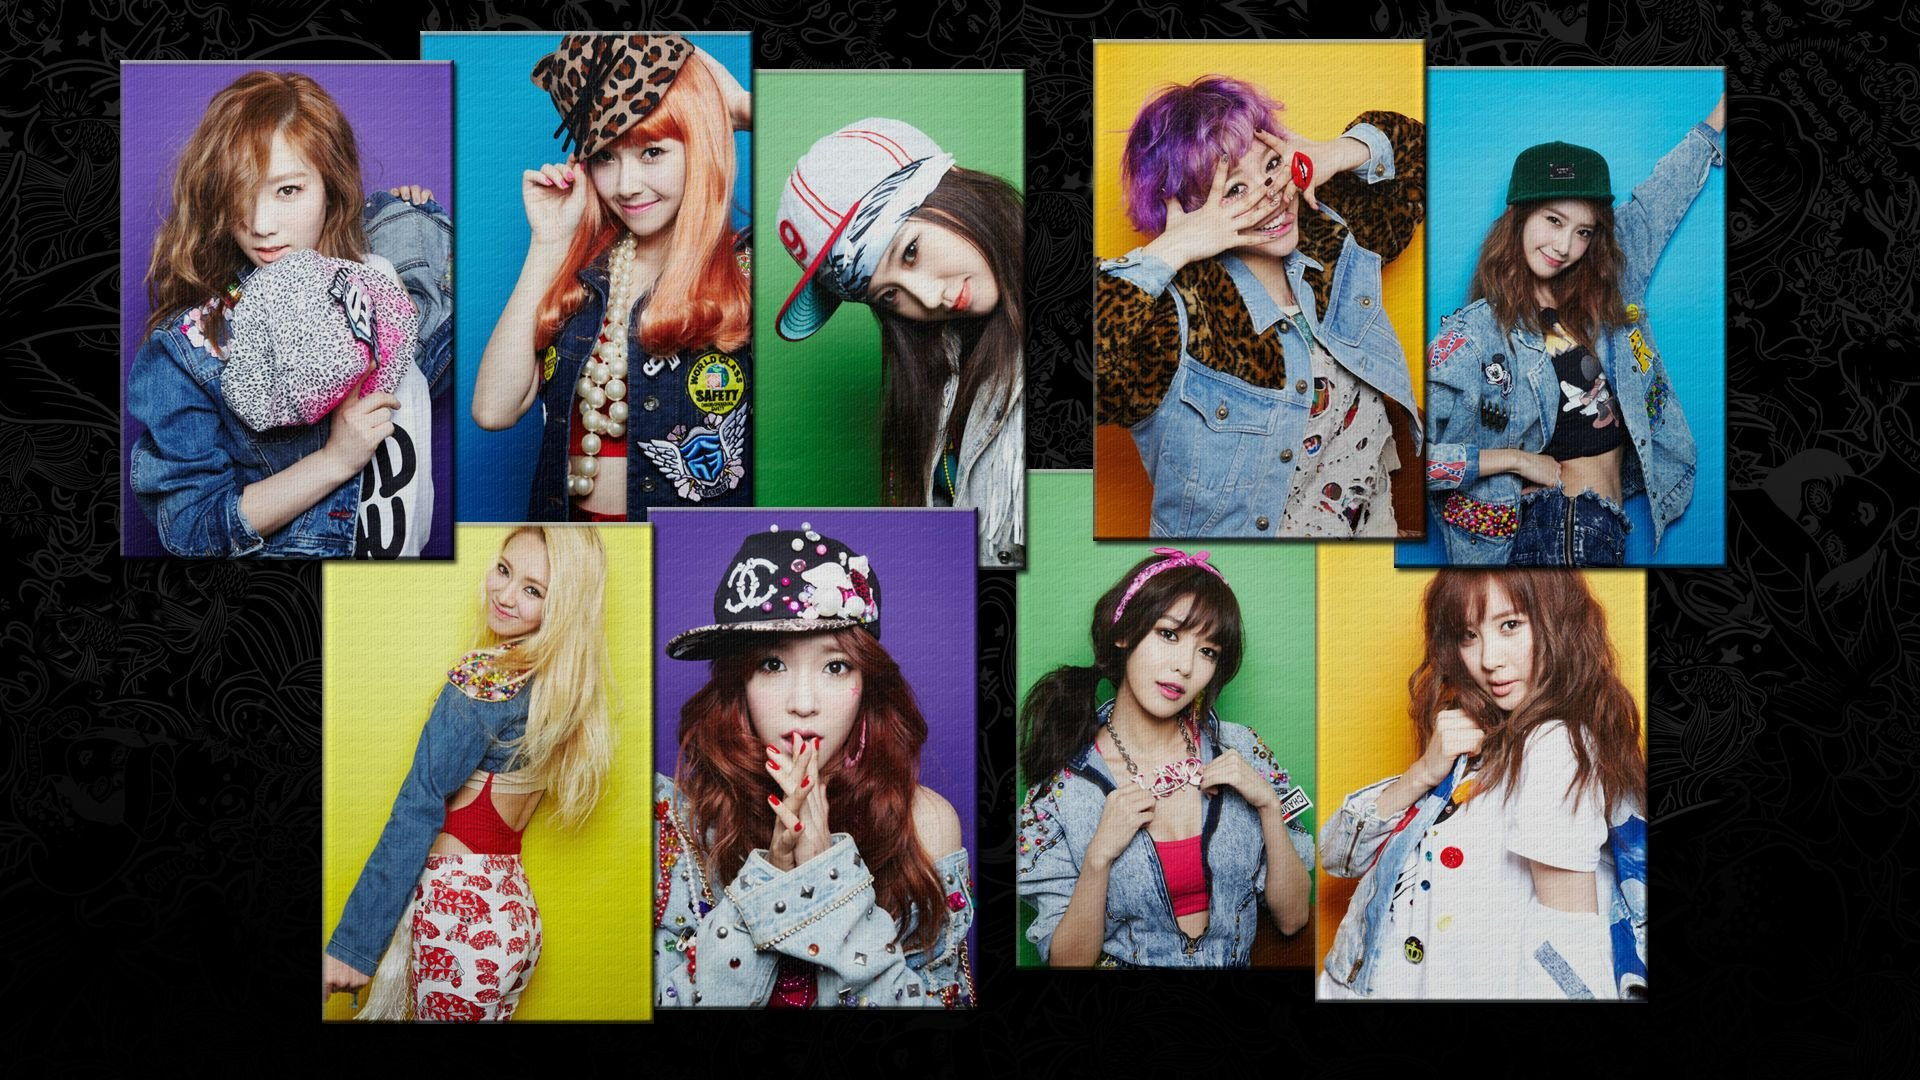 Wallpaper Hd Desktop Kpop